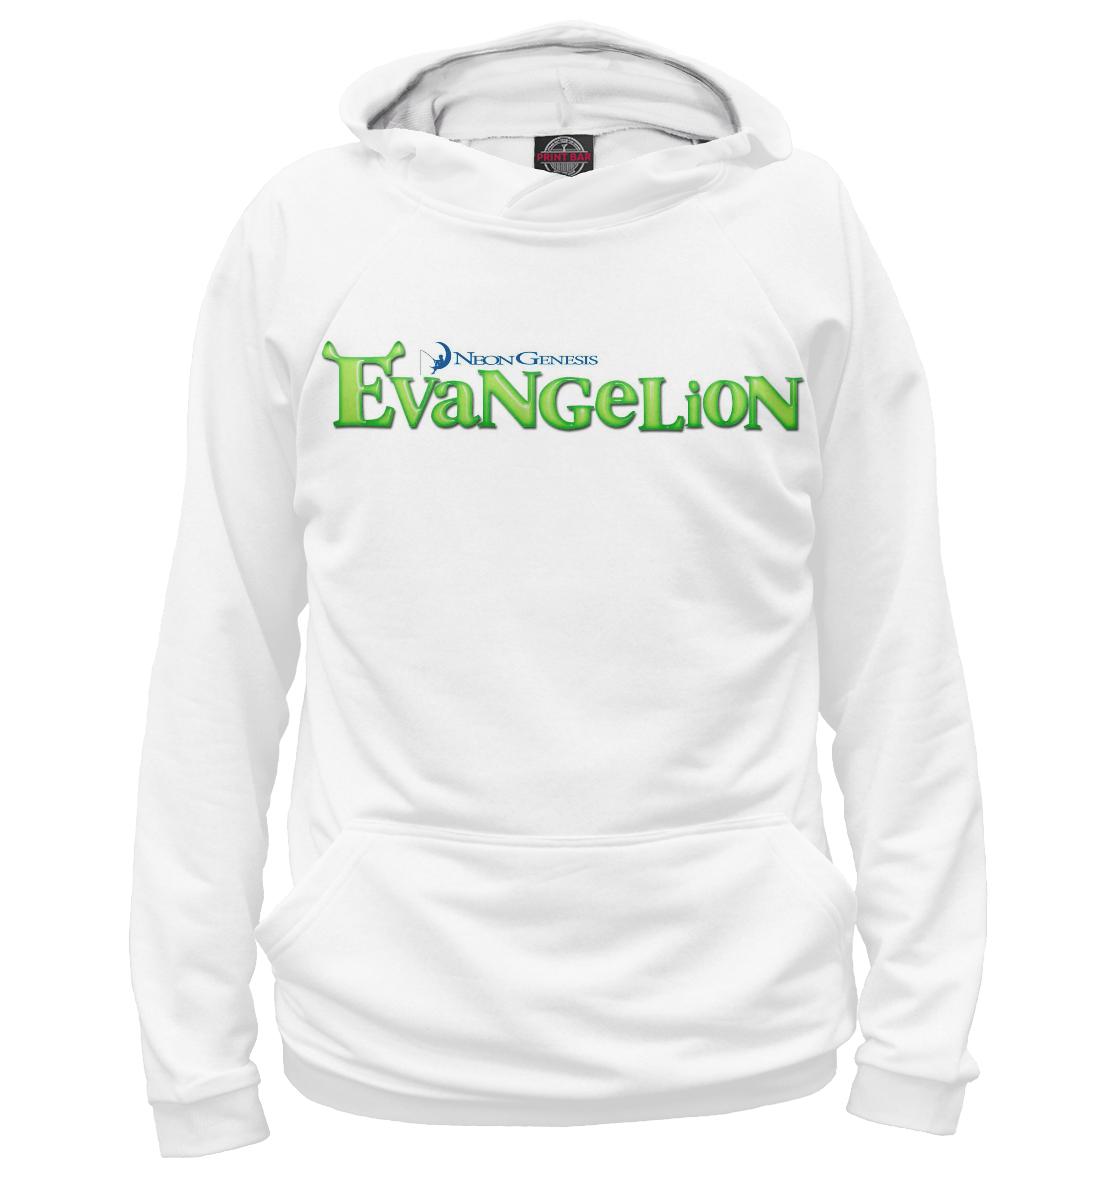 Купить Neon Genesis Shrek, Printbar, Худи, EVA-212890-hud-1